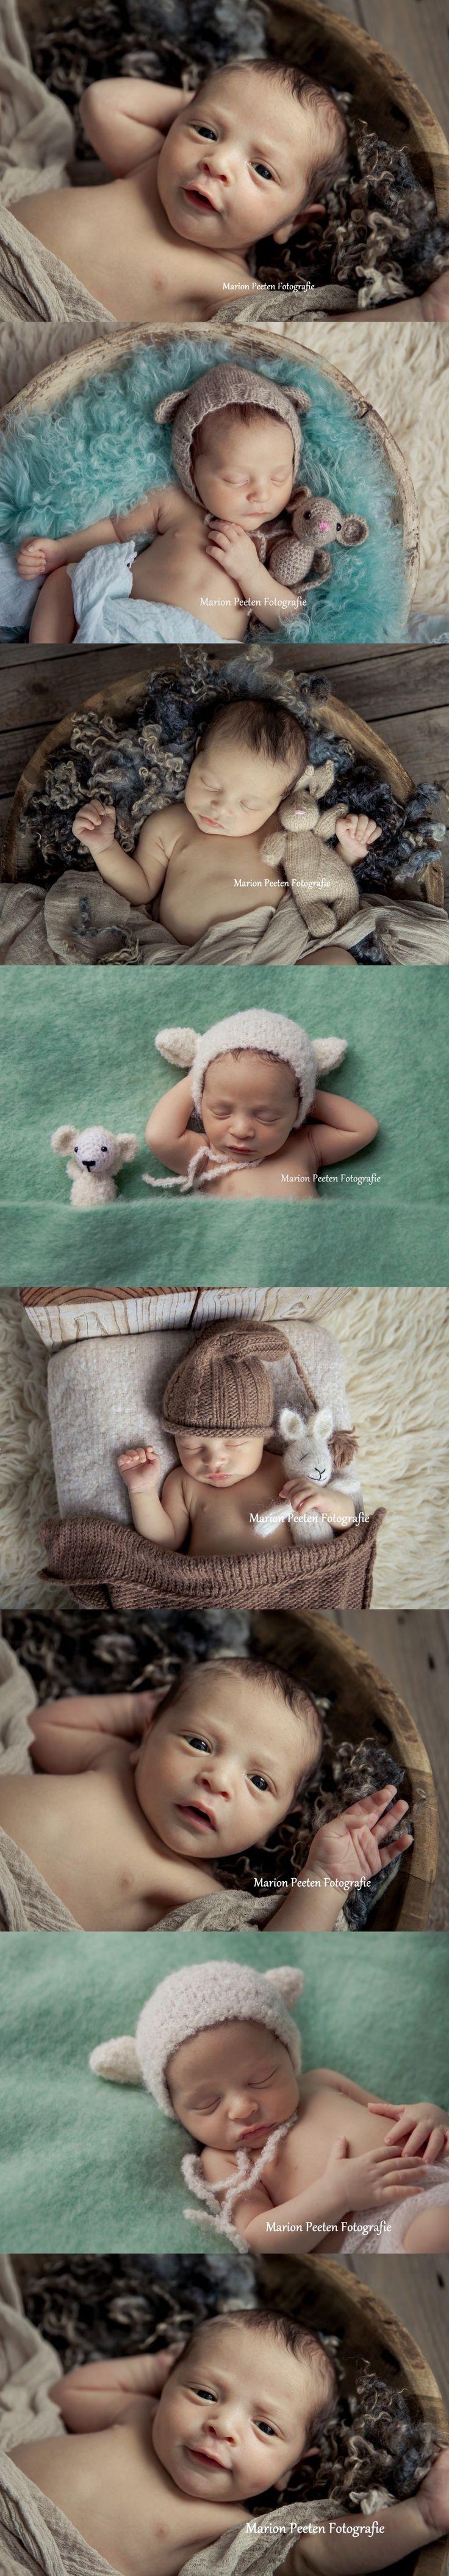 newborn photograph#love#newborn with eyes open#studio photography#newborn photoshoot#marion peeten fotografie#newborn in studio#